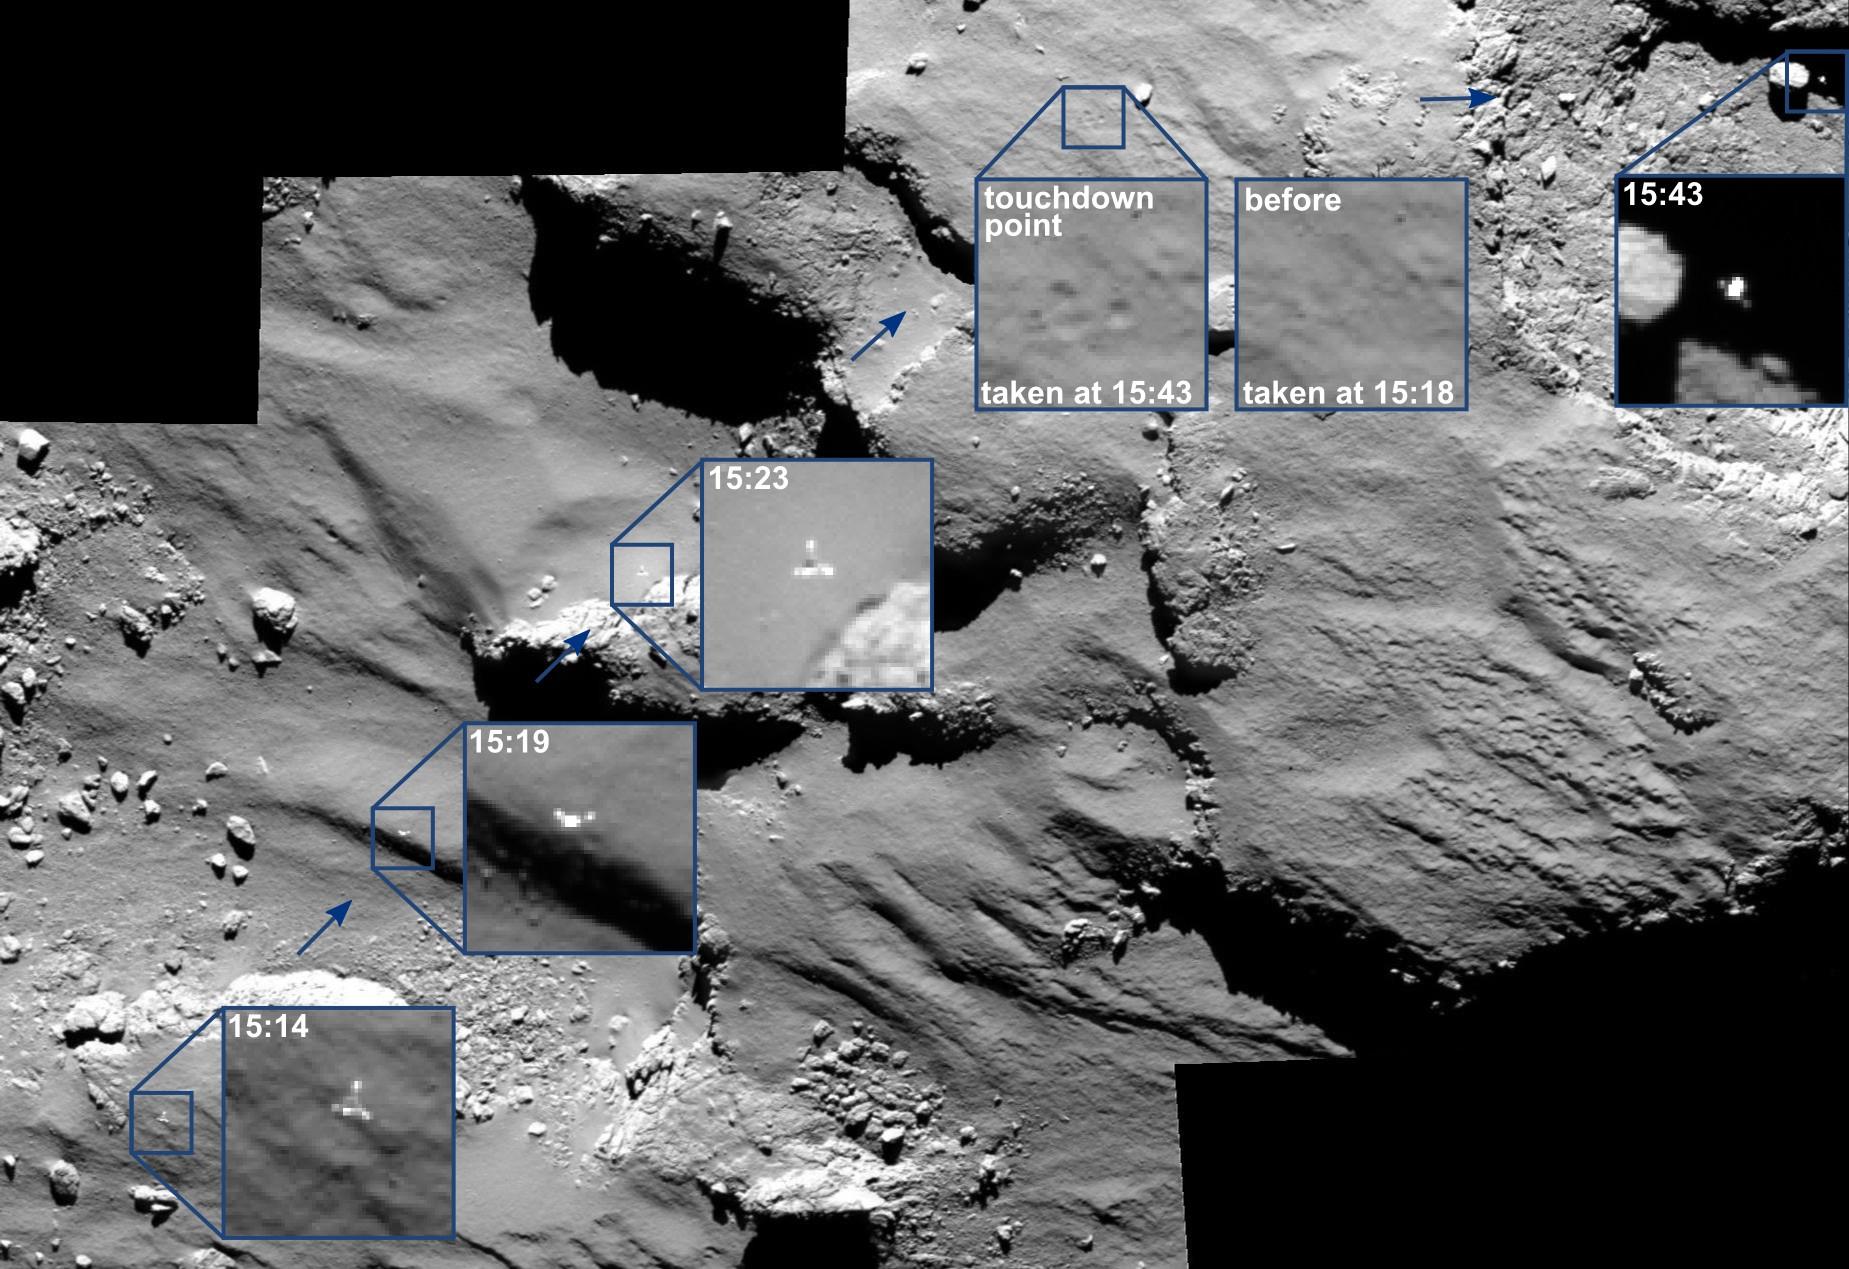 I rimbalzi di Philae visti da OSIRIS a bordo di Rosetta (ESA): Crediti: ESA/Rosetta/MPS for OSIRIS Team MPS/UPD/LAM/IAA/SSO/INTA/UPM/DASP/IDA